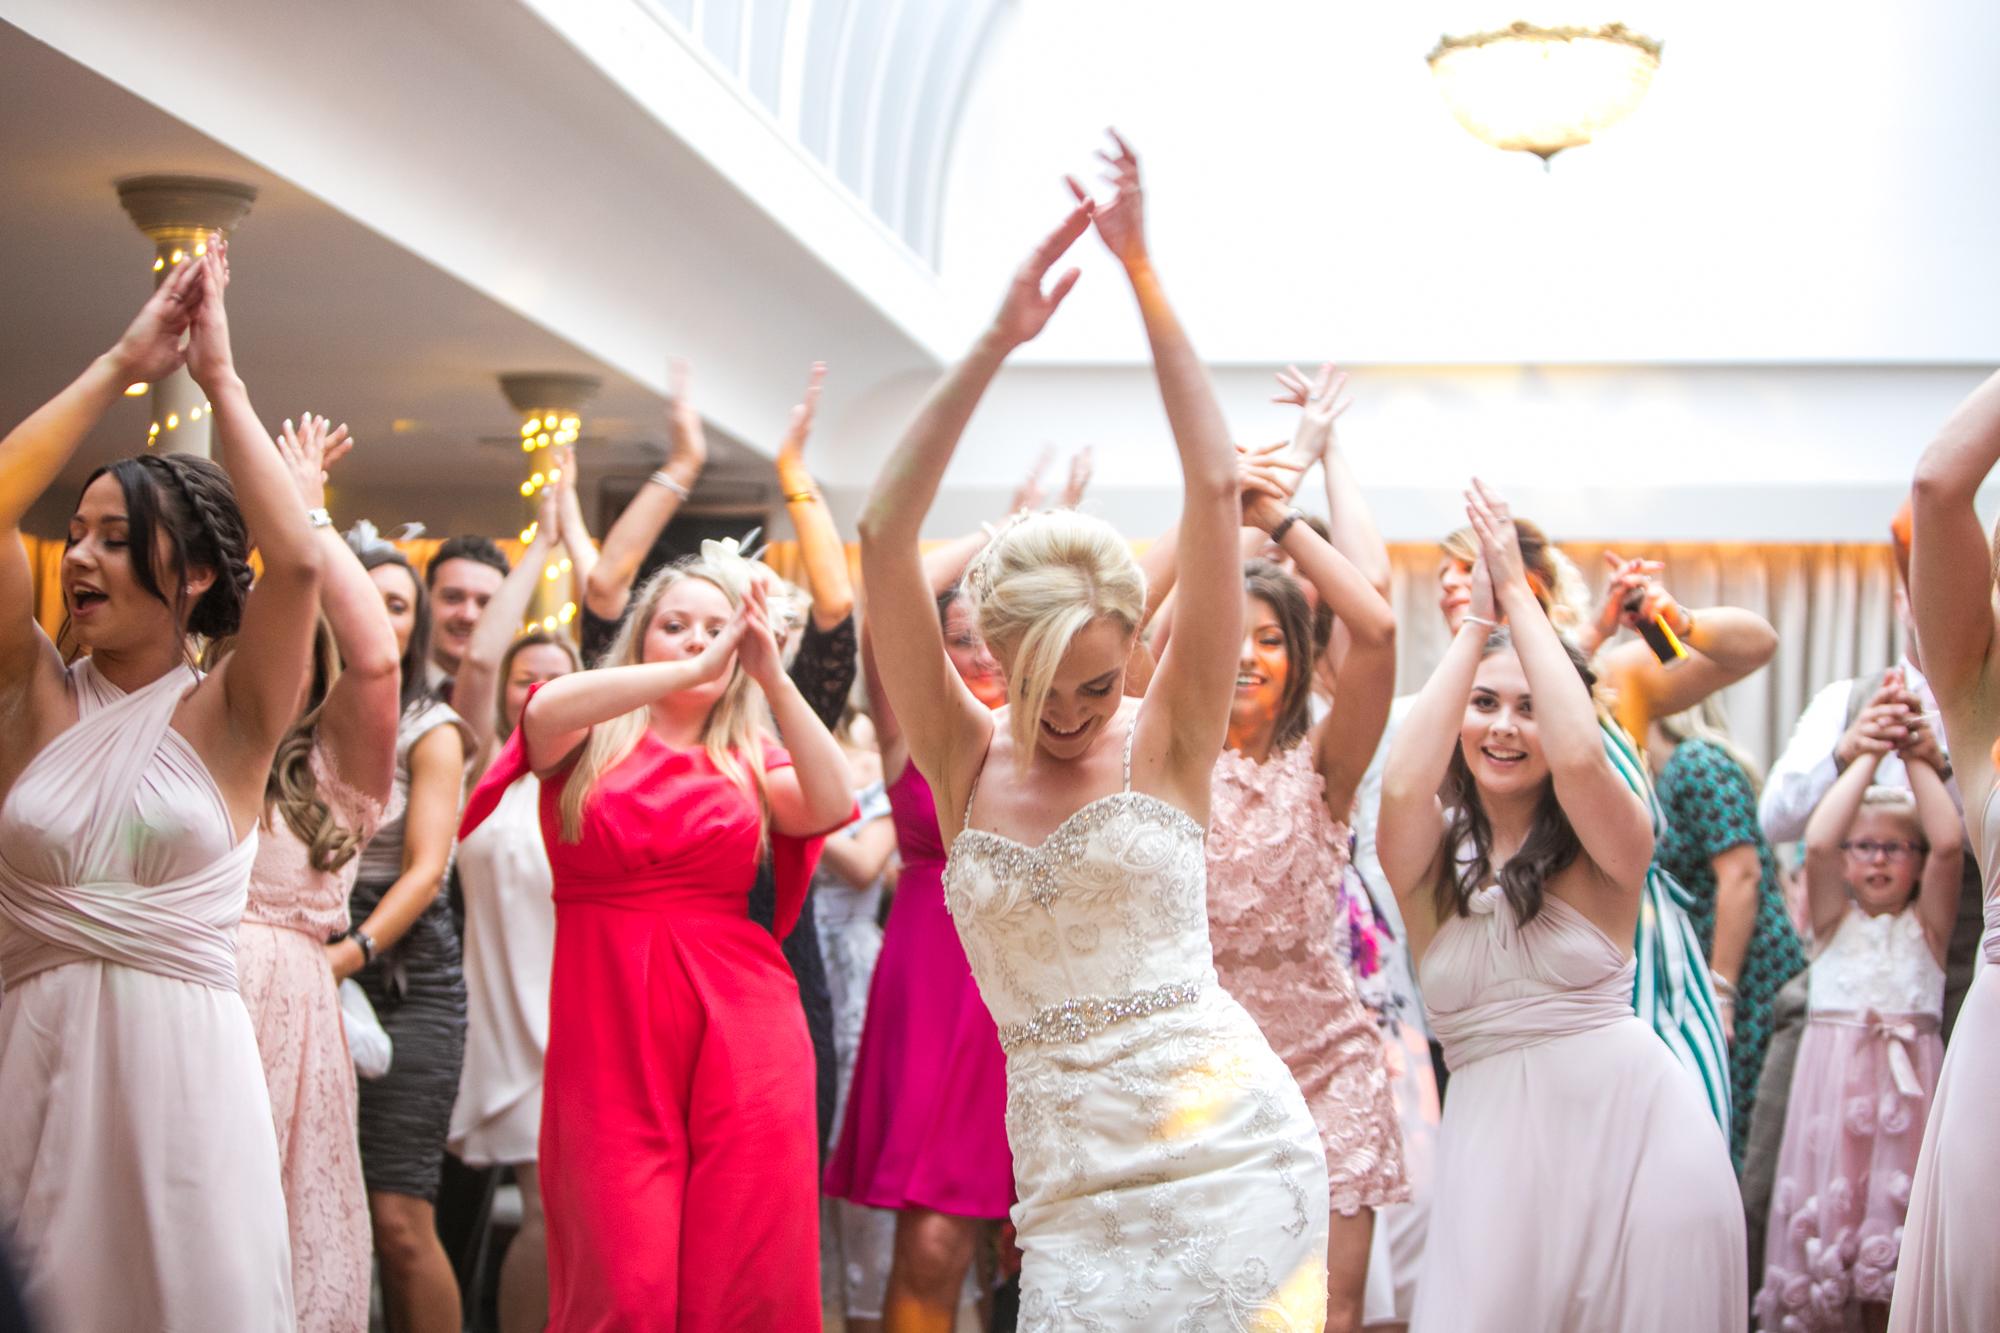 Headlam hall wedding photographer-1-17.jpg